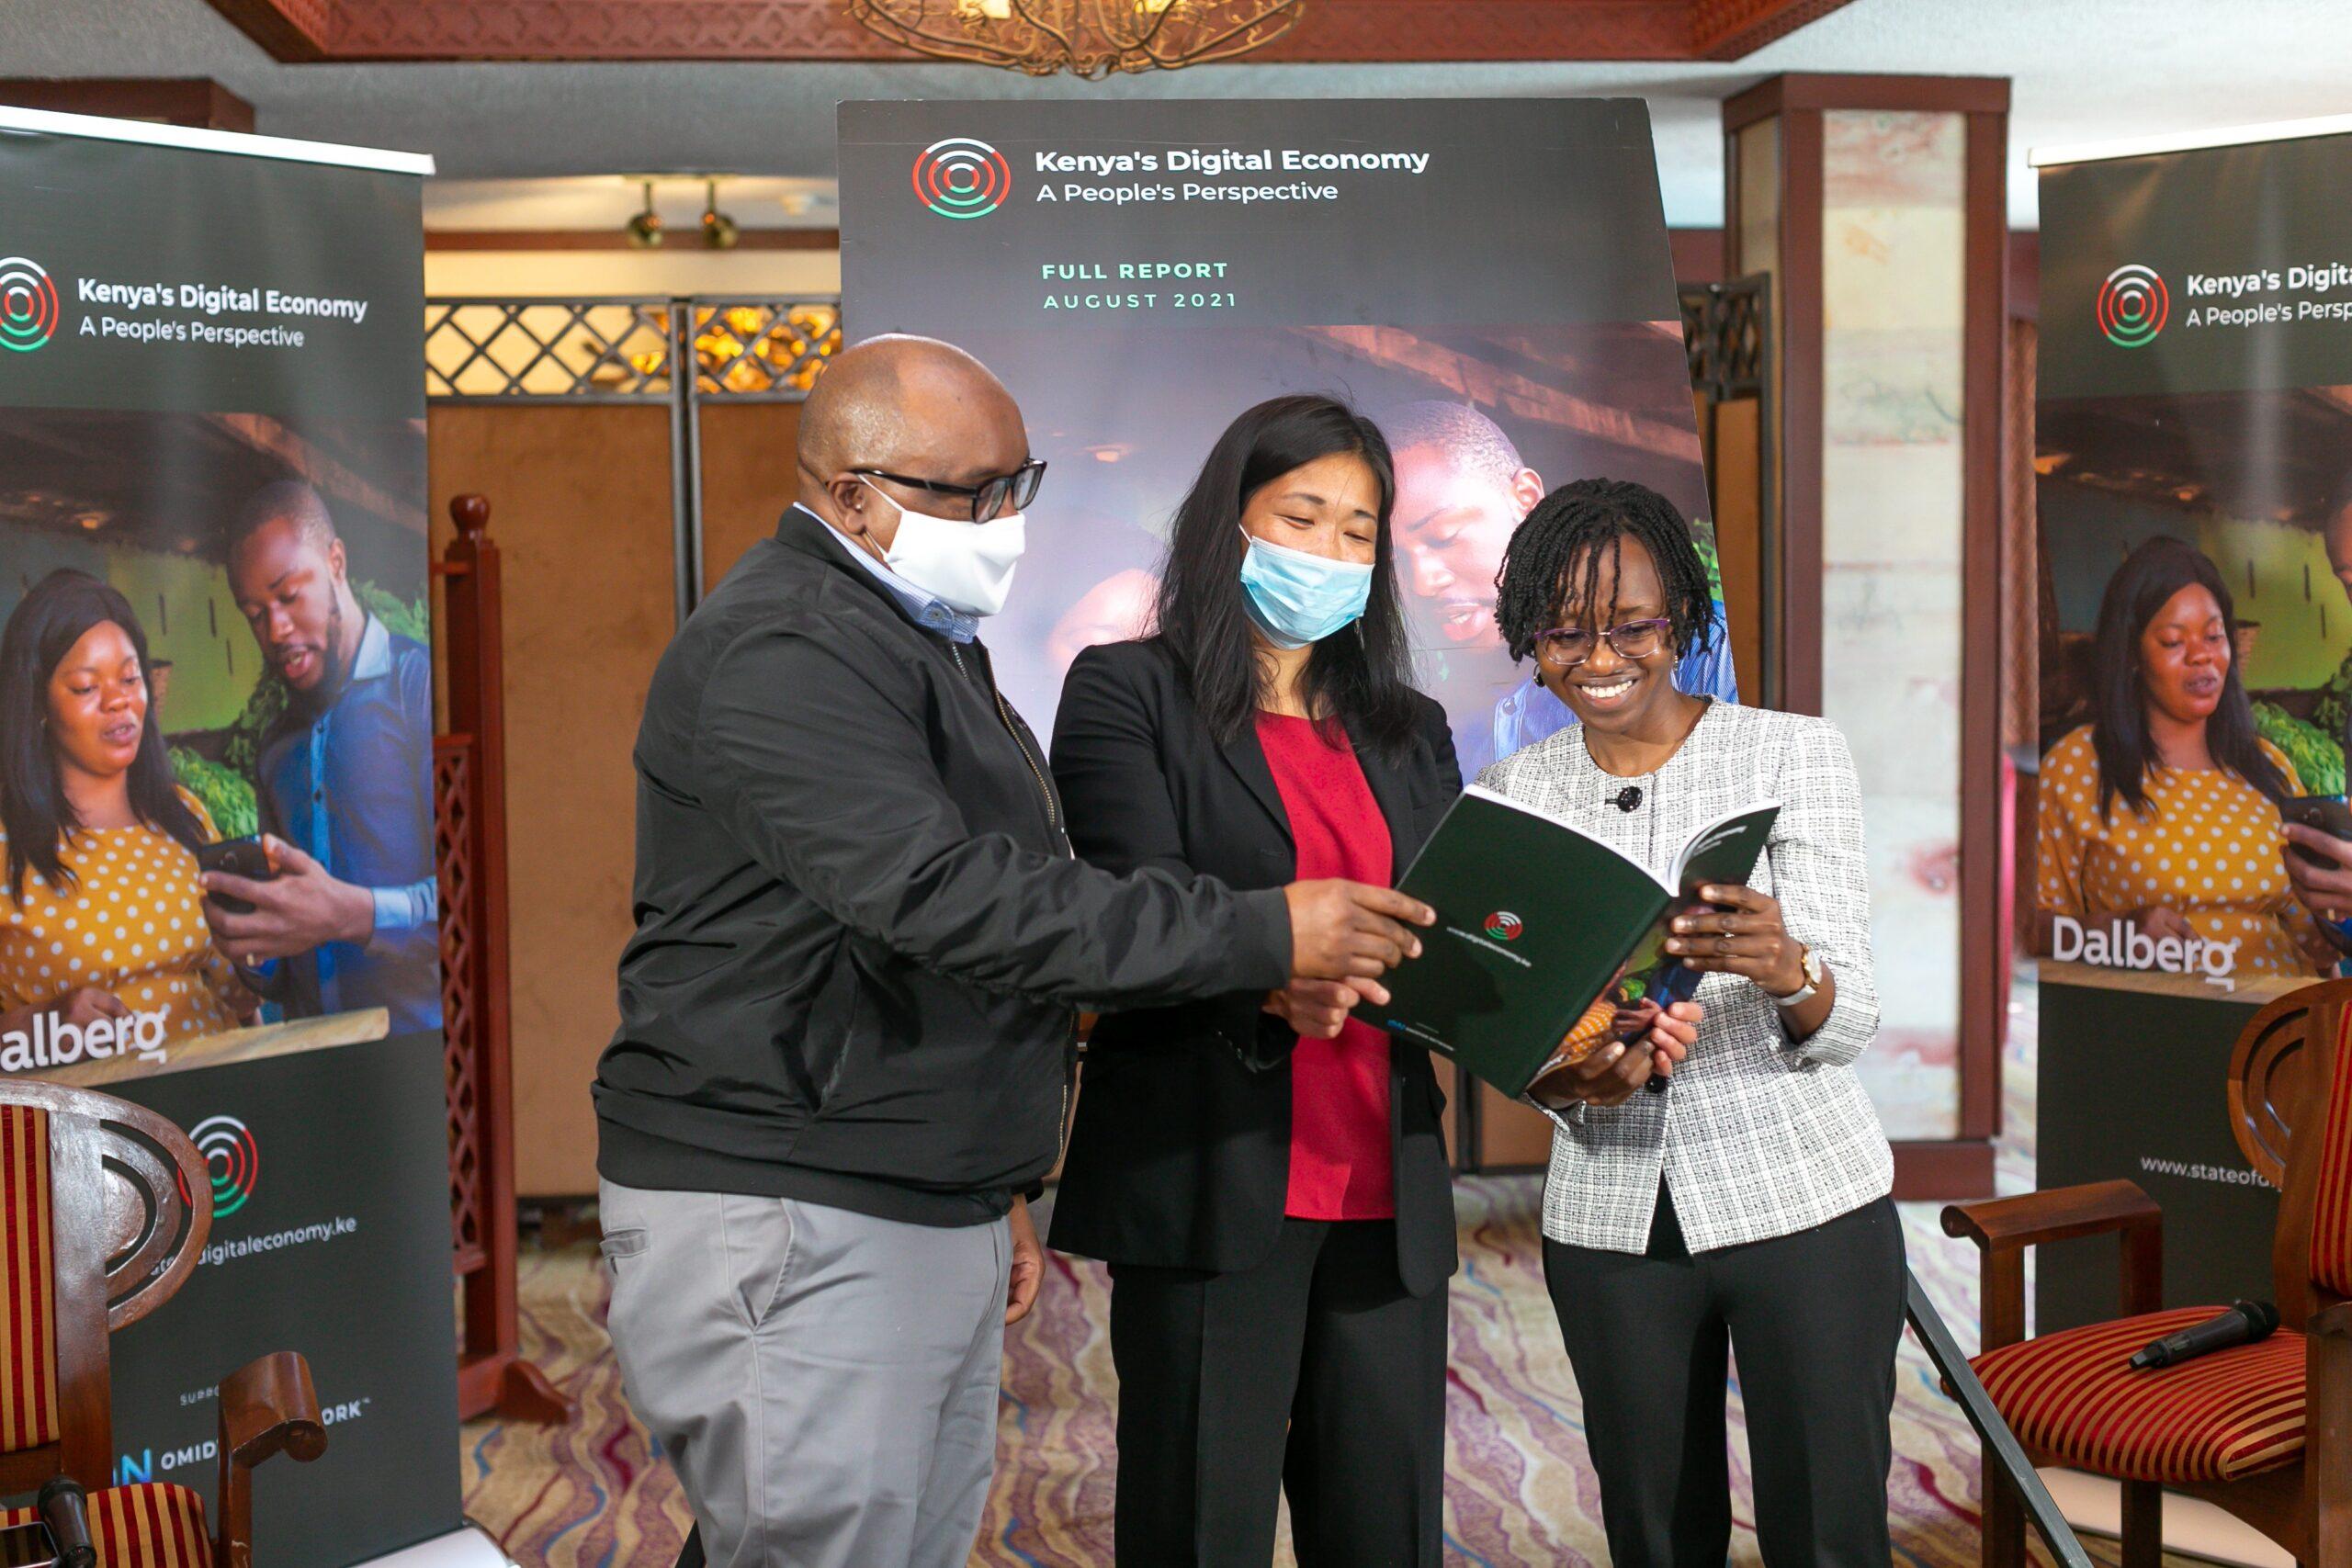 """Digital Devices and Services Improving Lives and Livelihoods of Kenyans,"" Survey Reveals"